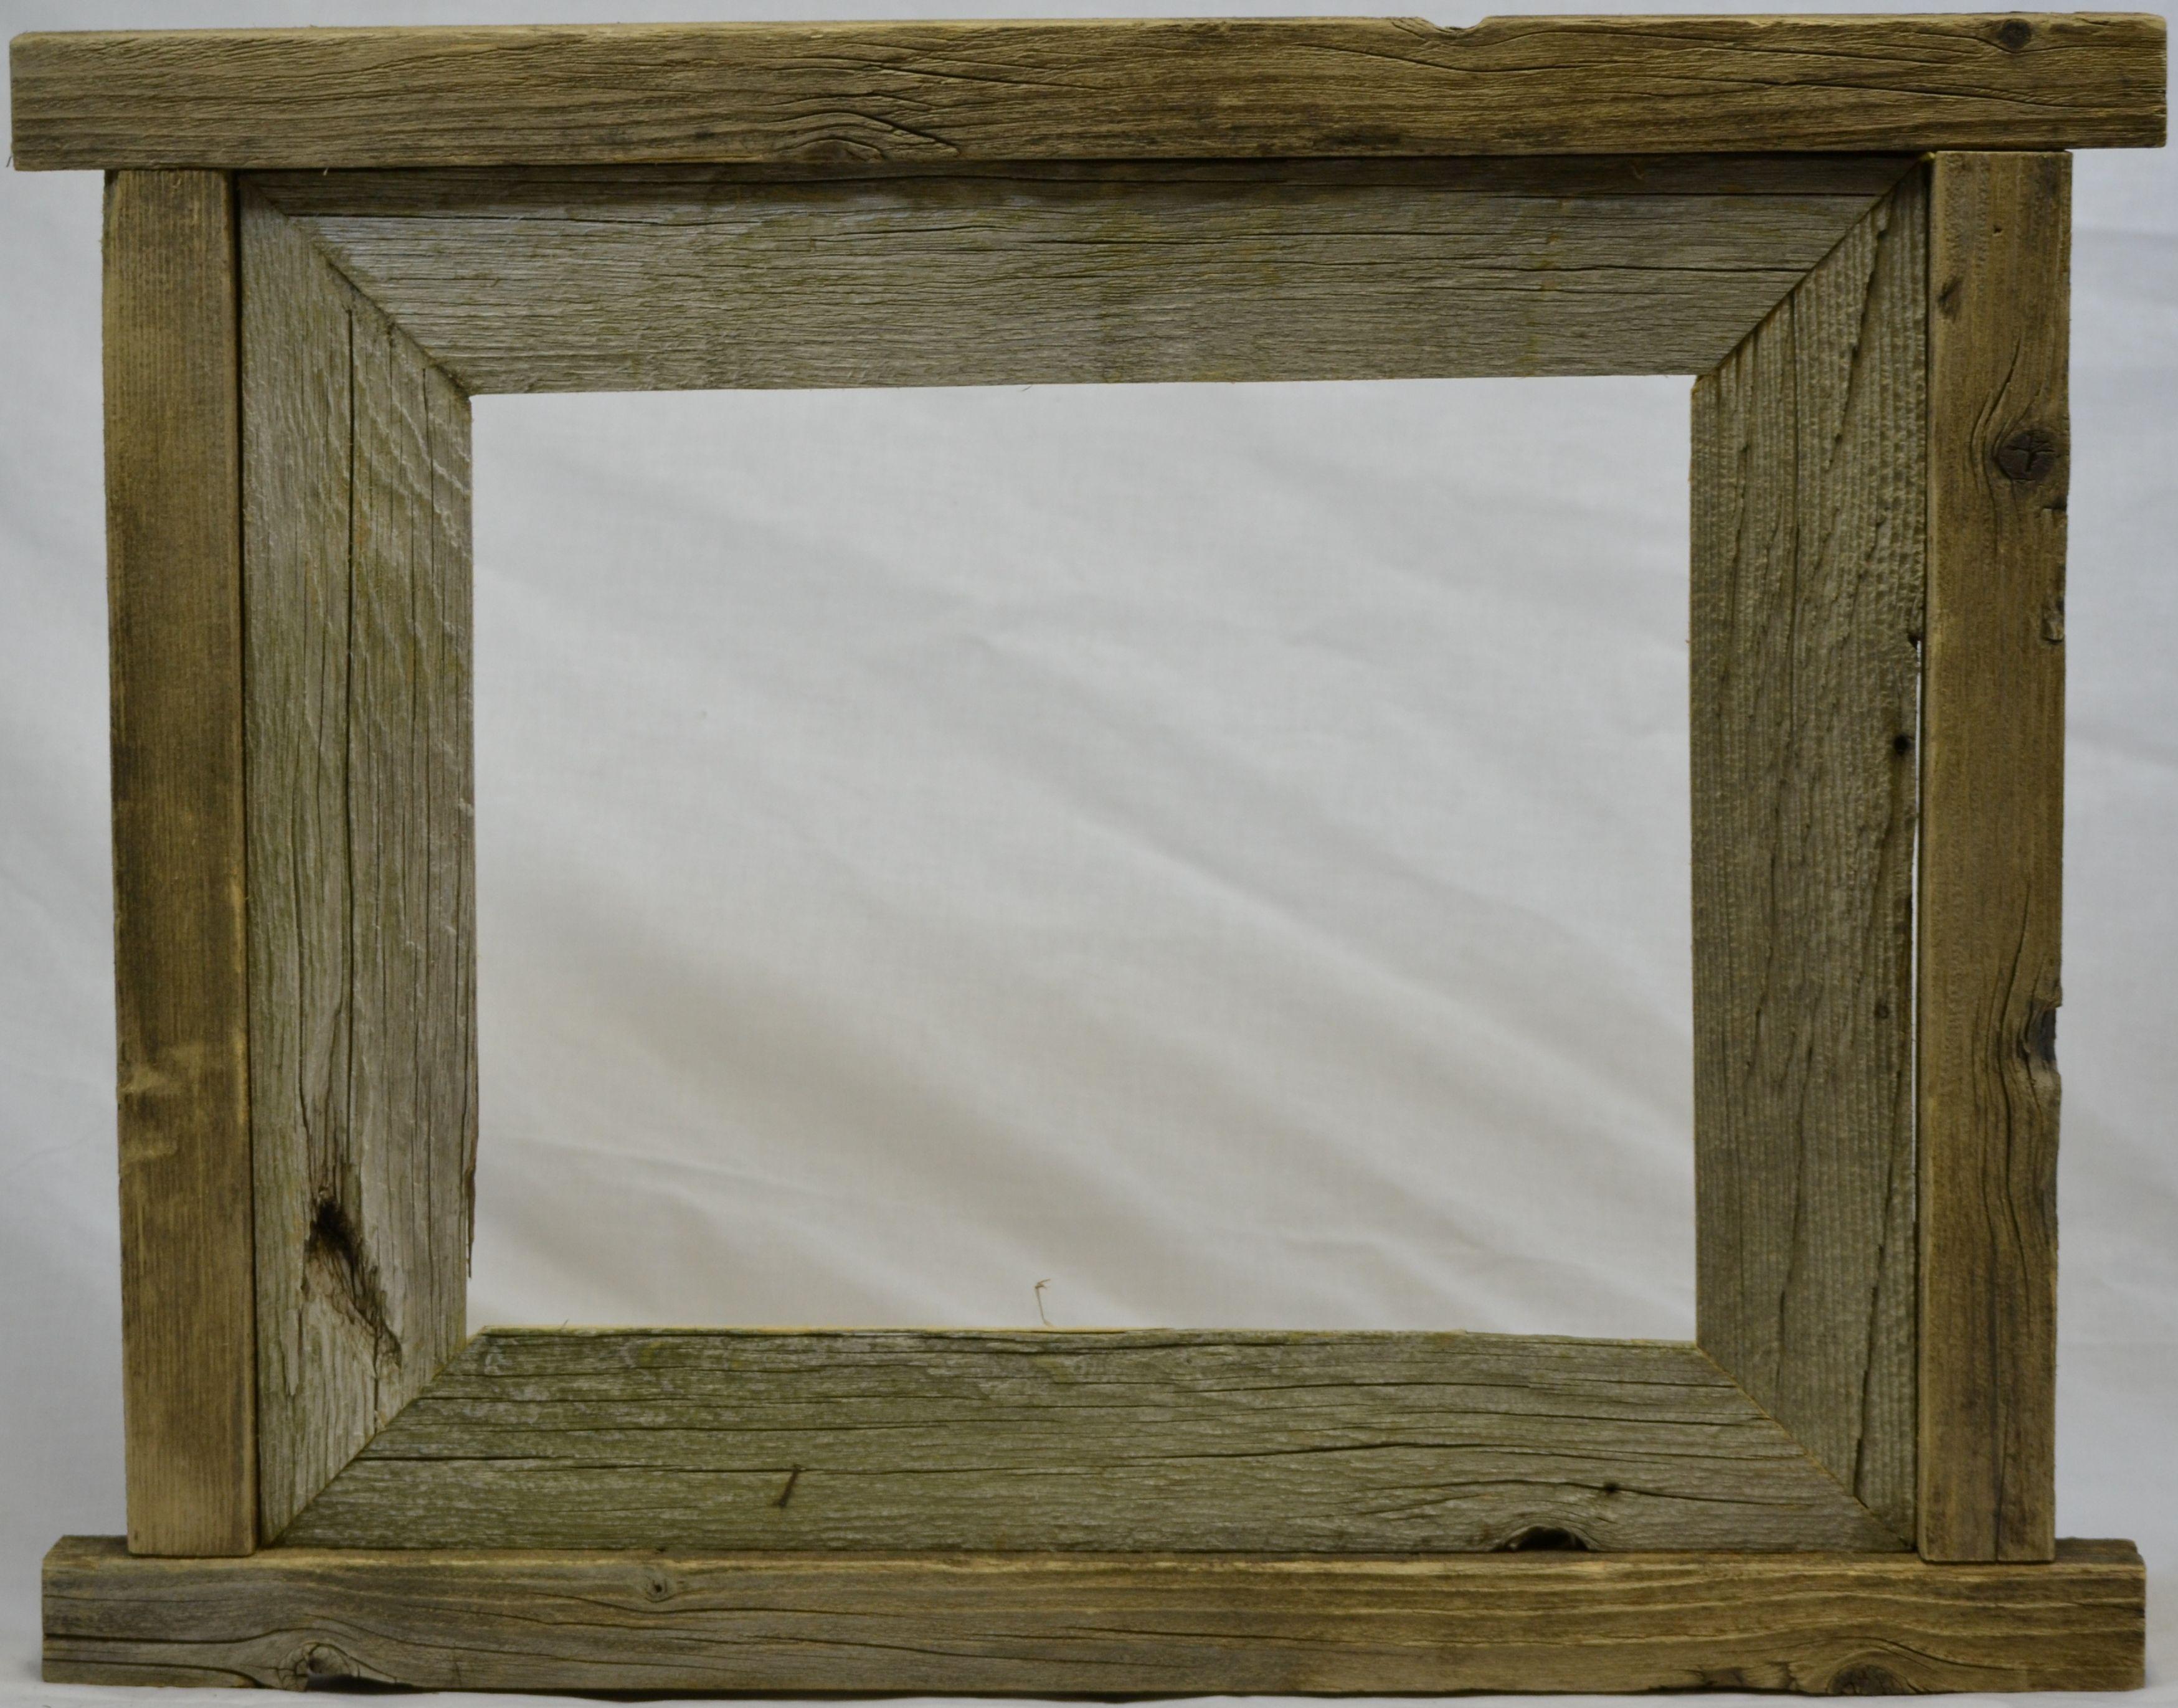 Rustic Wooden Frame Rustic barn wood picture frame | Workshop ...